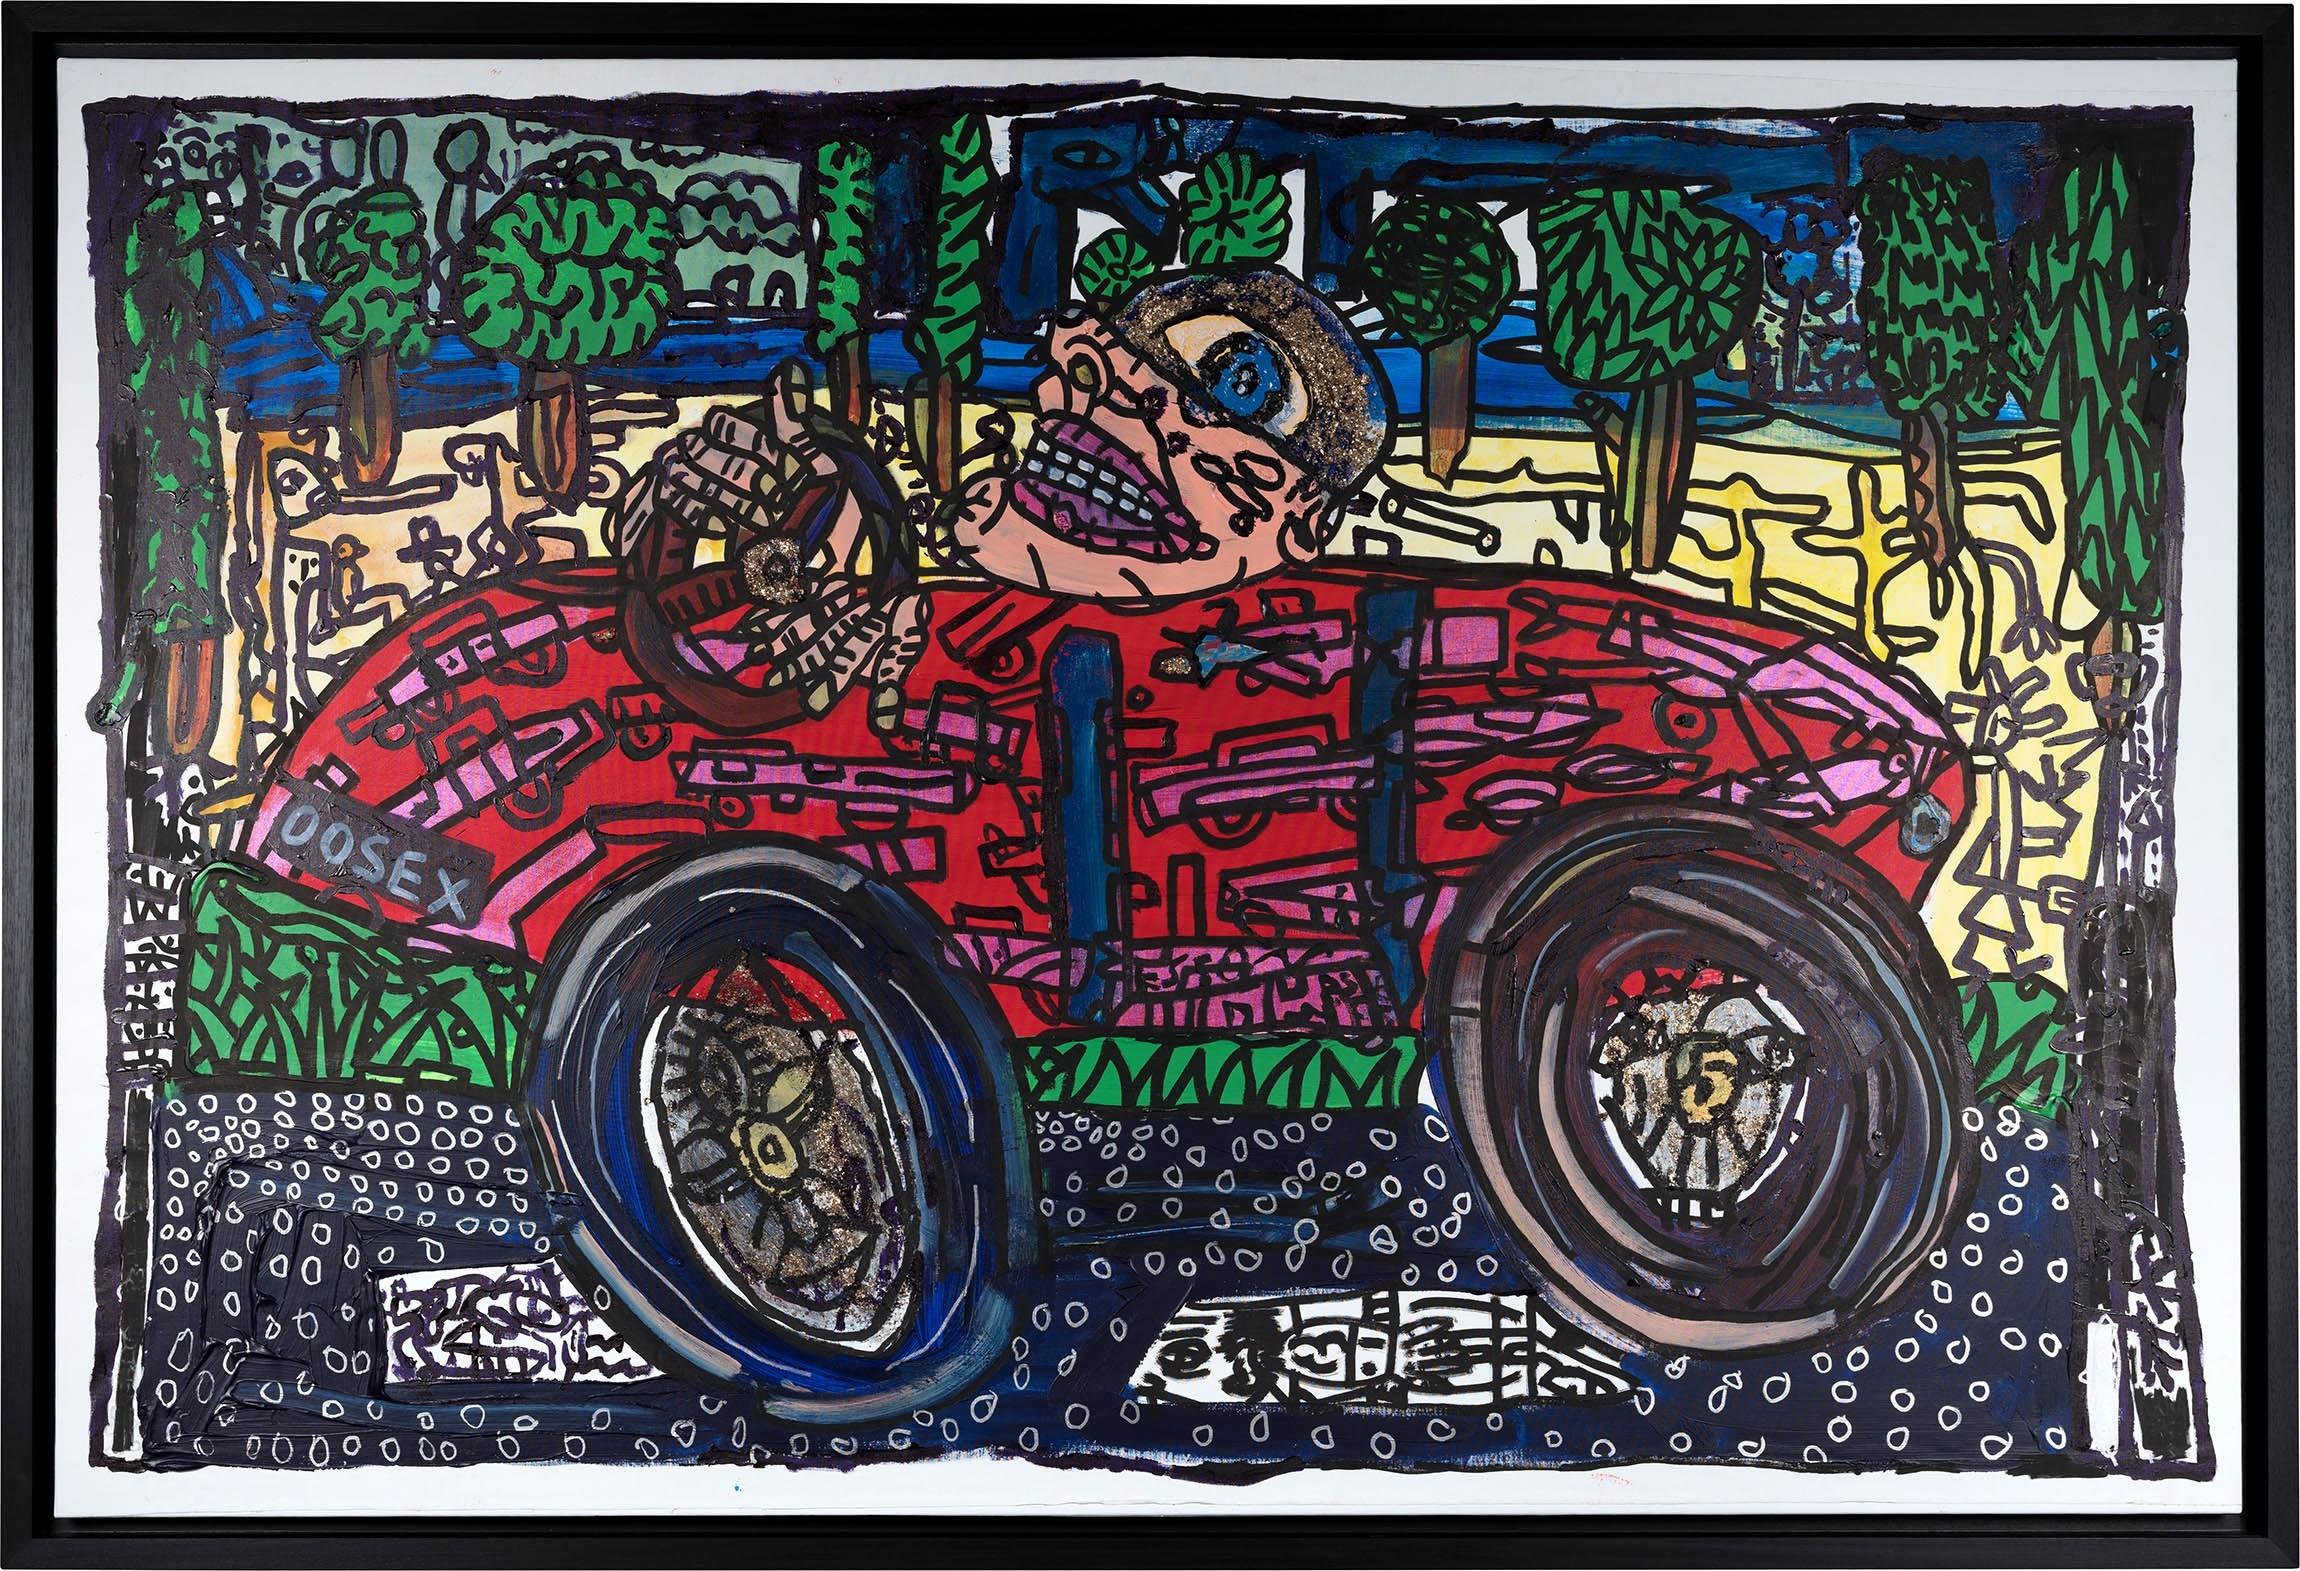 Extraordinaire Reoosex - Voiture vitesse et One Place Man - Robert COMBAS - Artistes JP-94